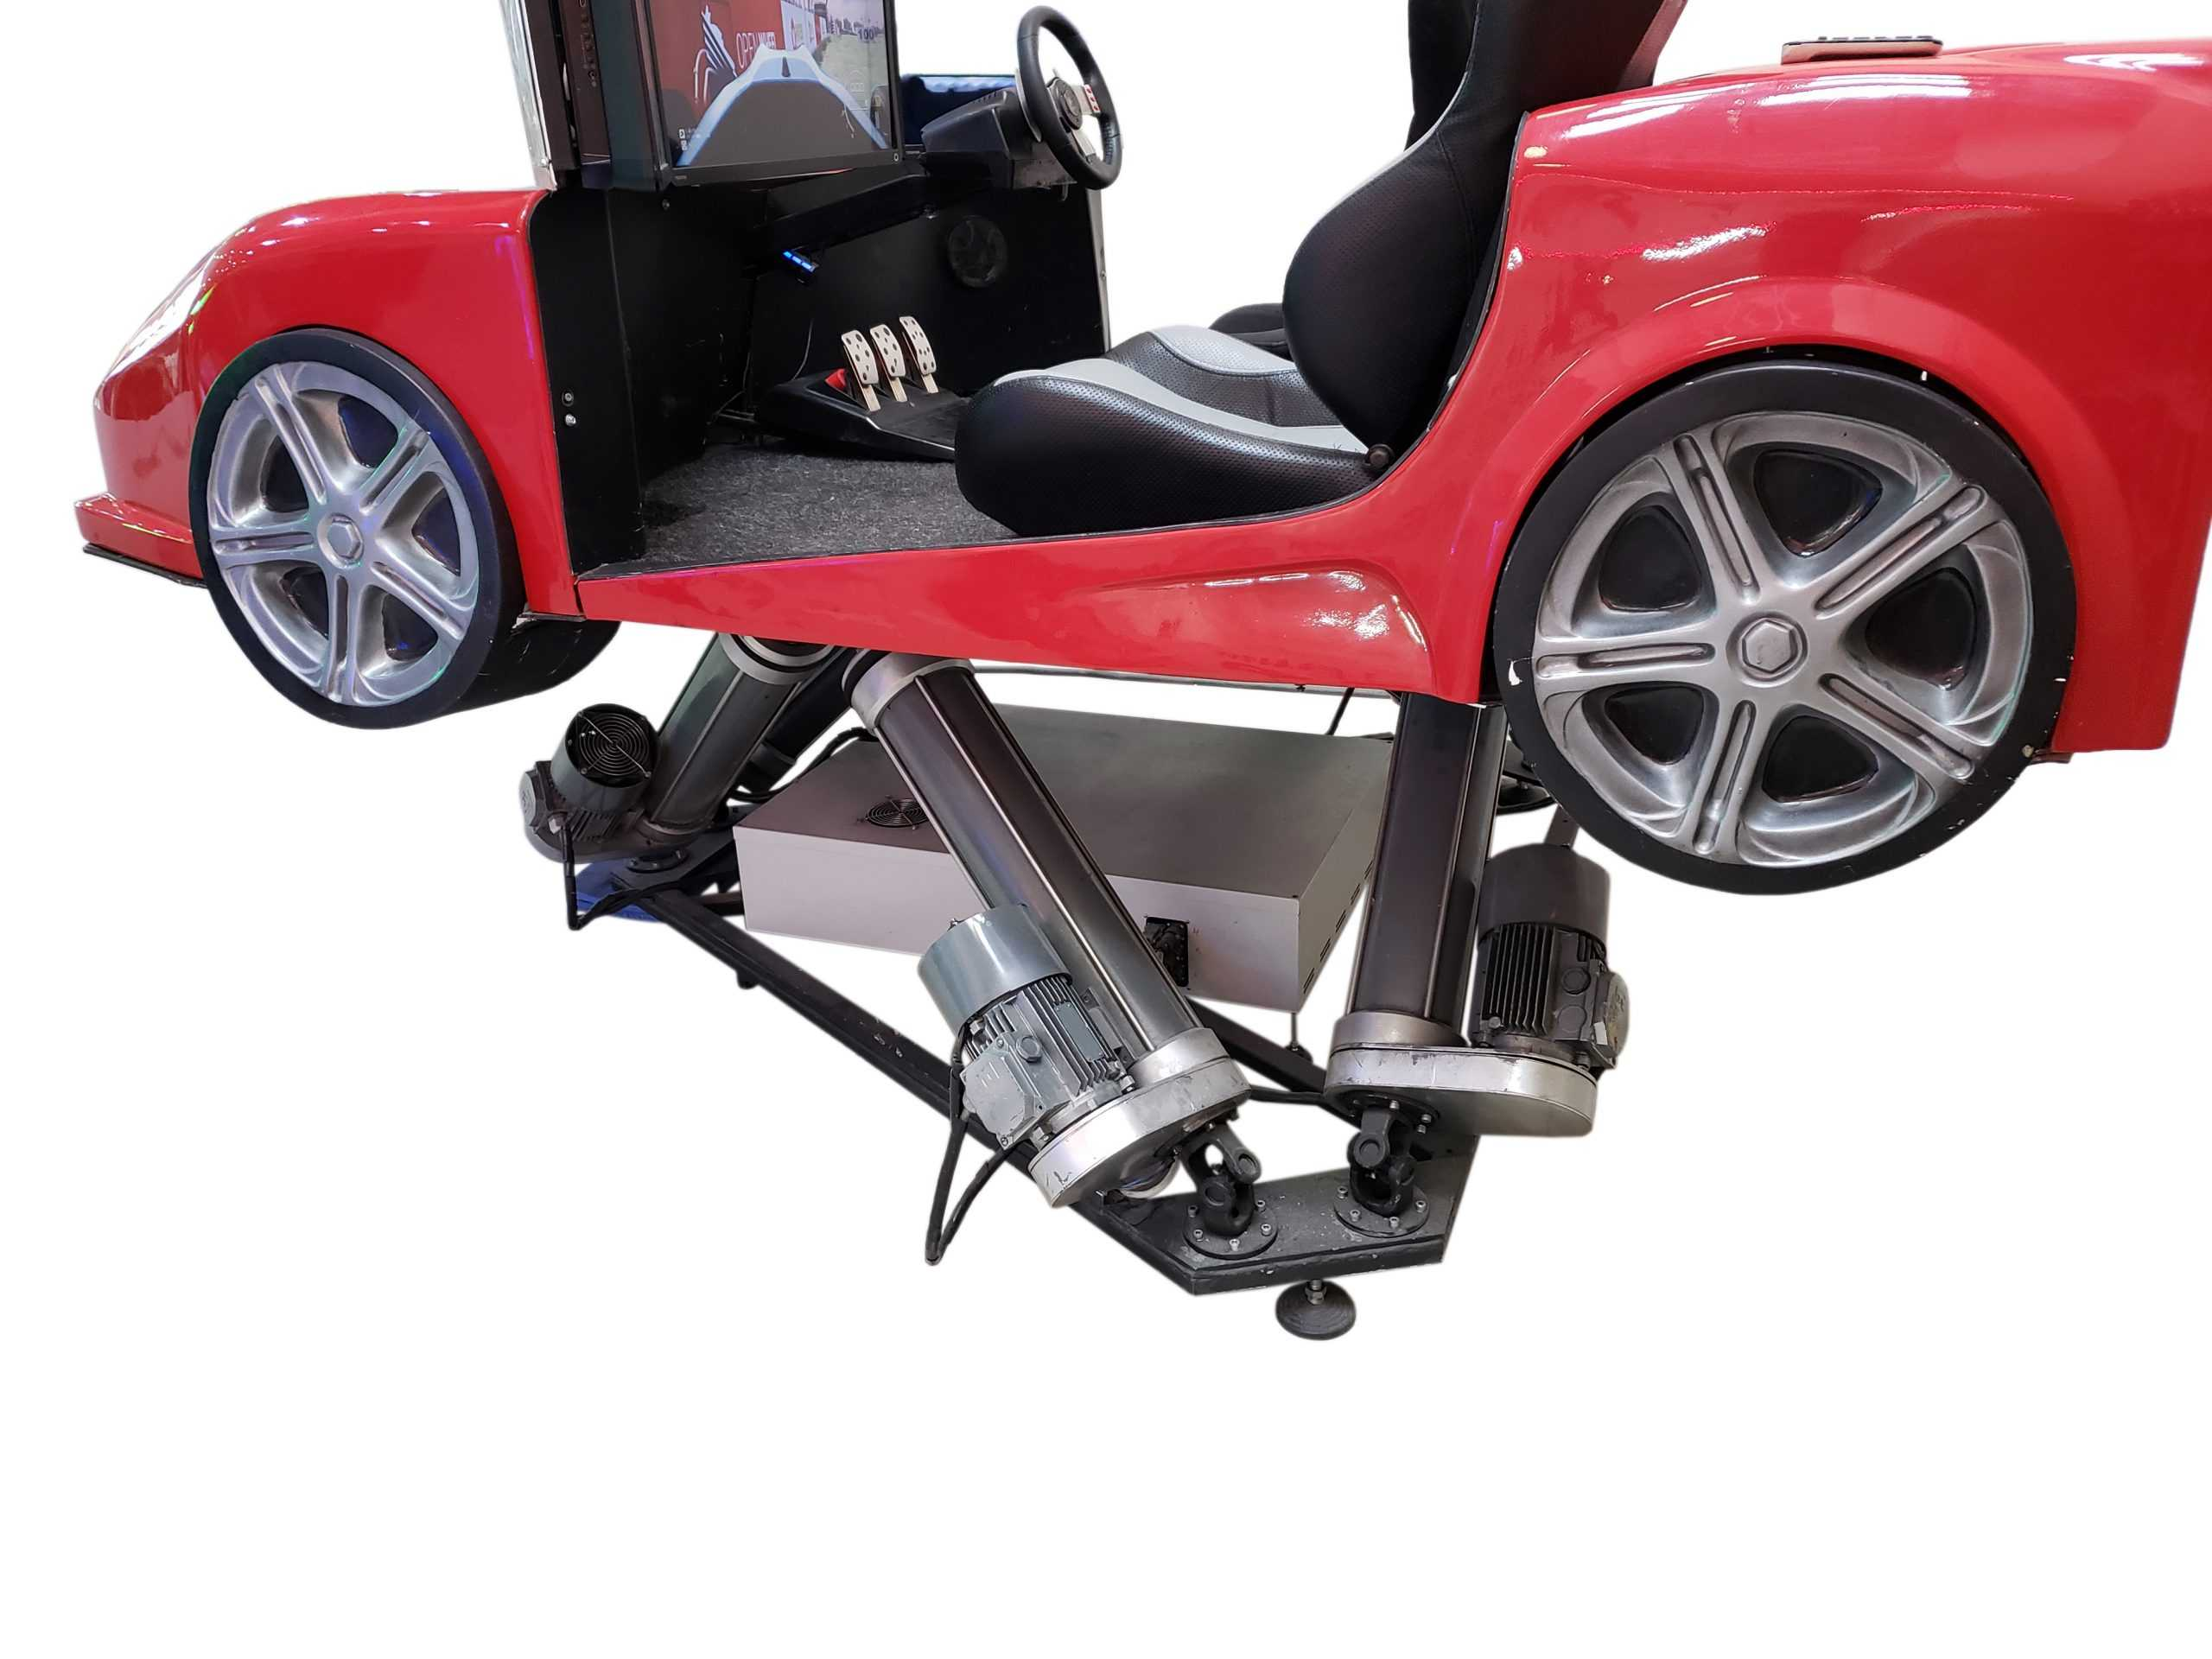 Ferrari_1 Full motion racing simulator 2dof, 3dof,4dof,6dof motion platform